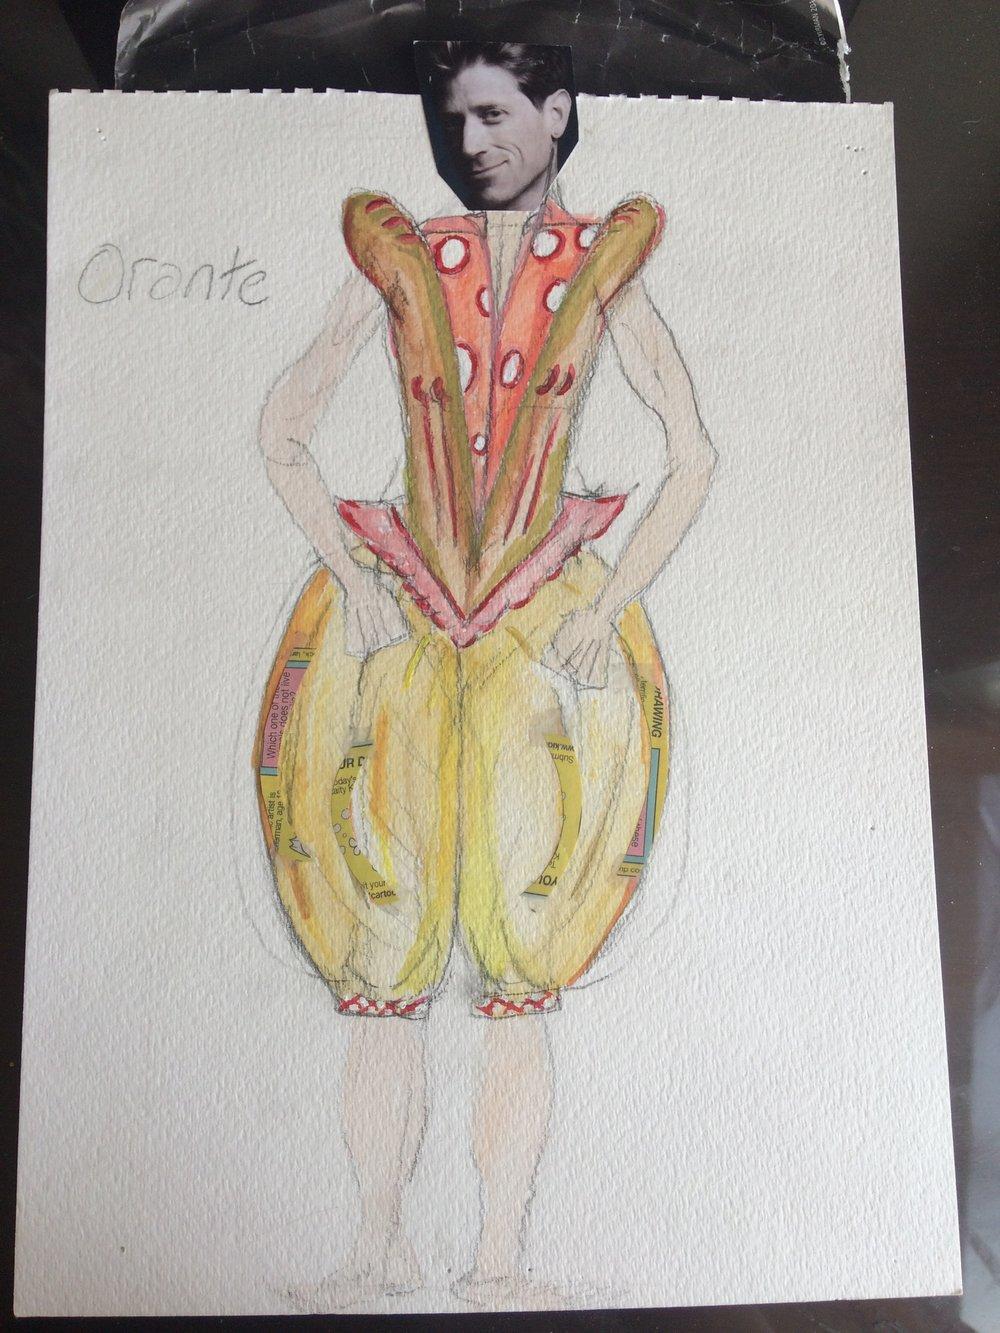 The Misanthrope- Oronte